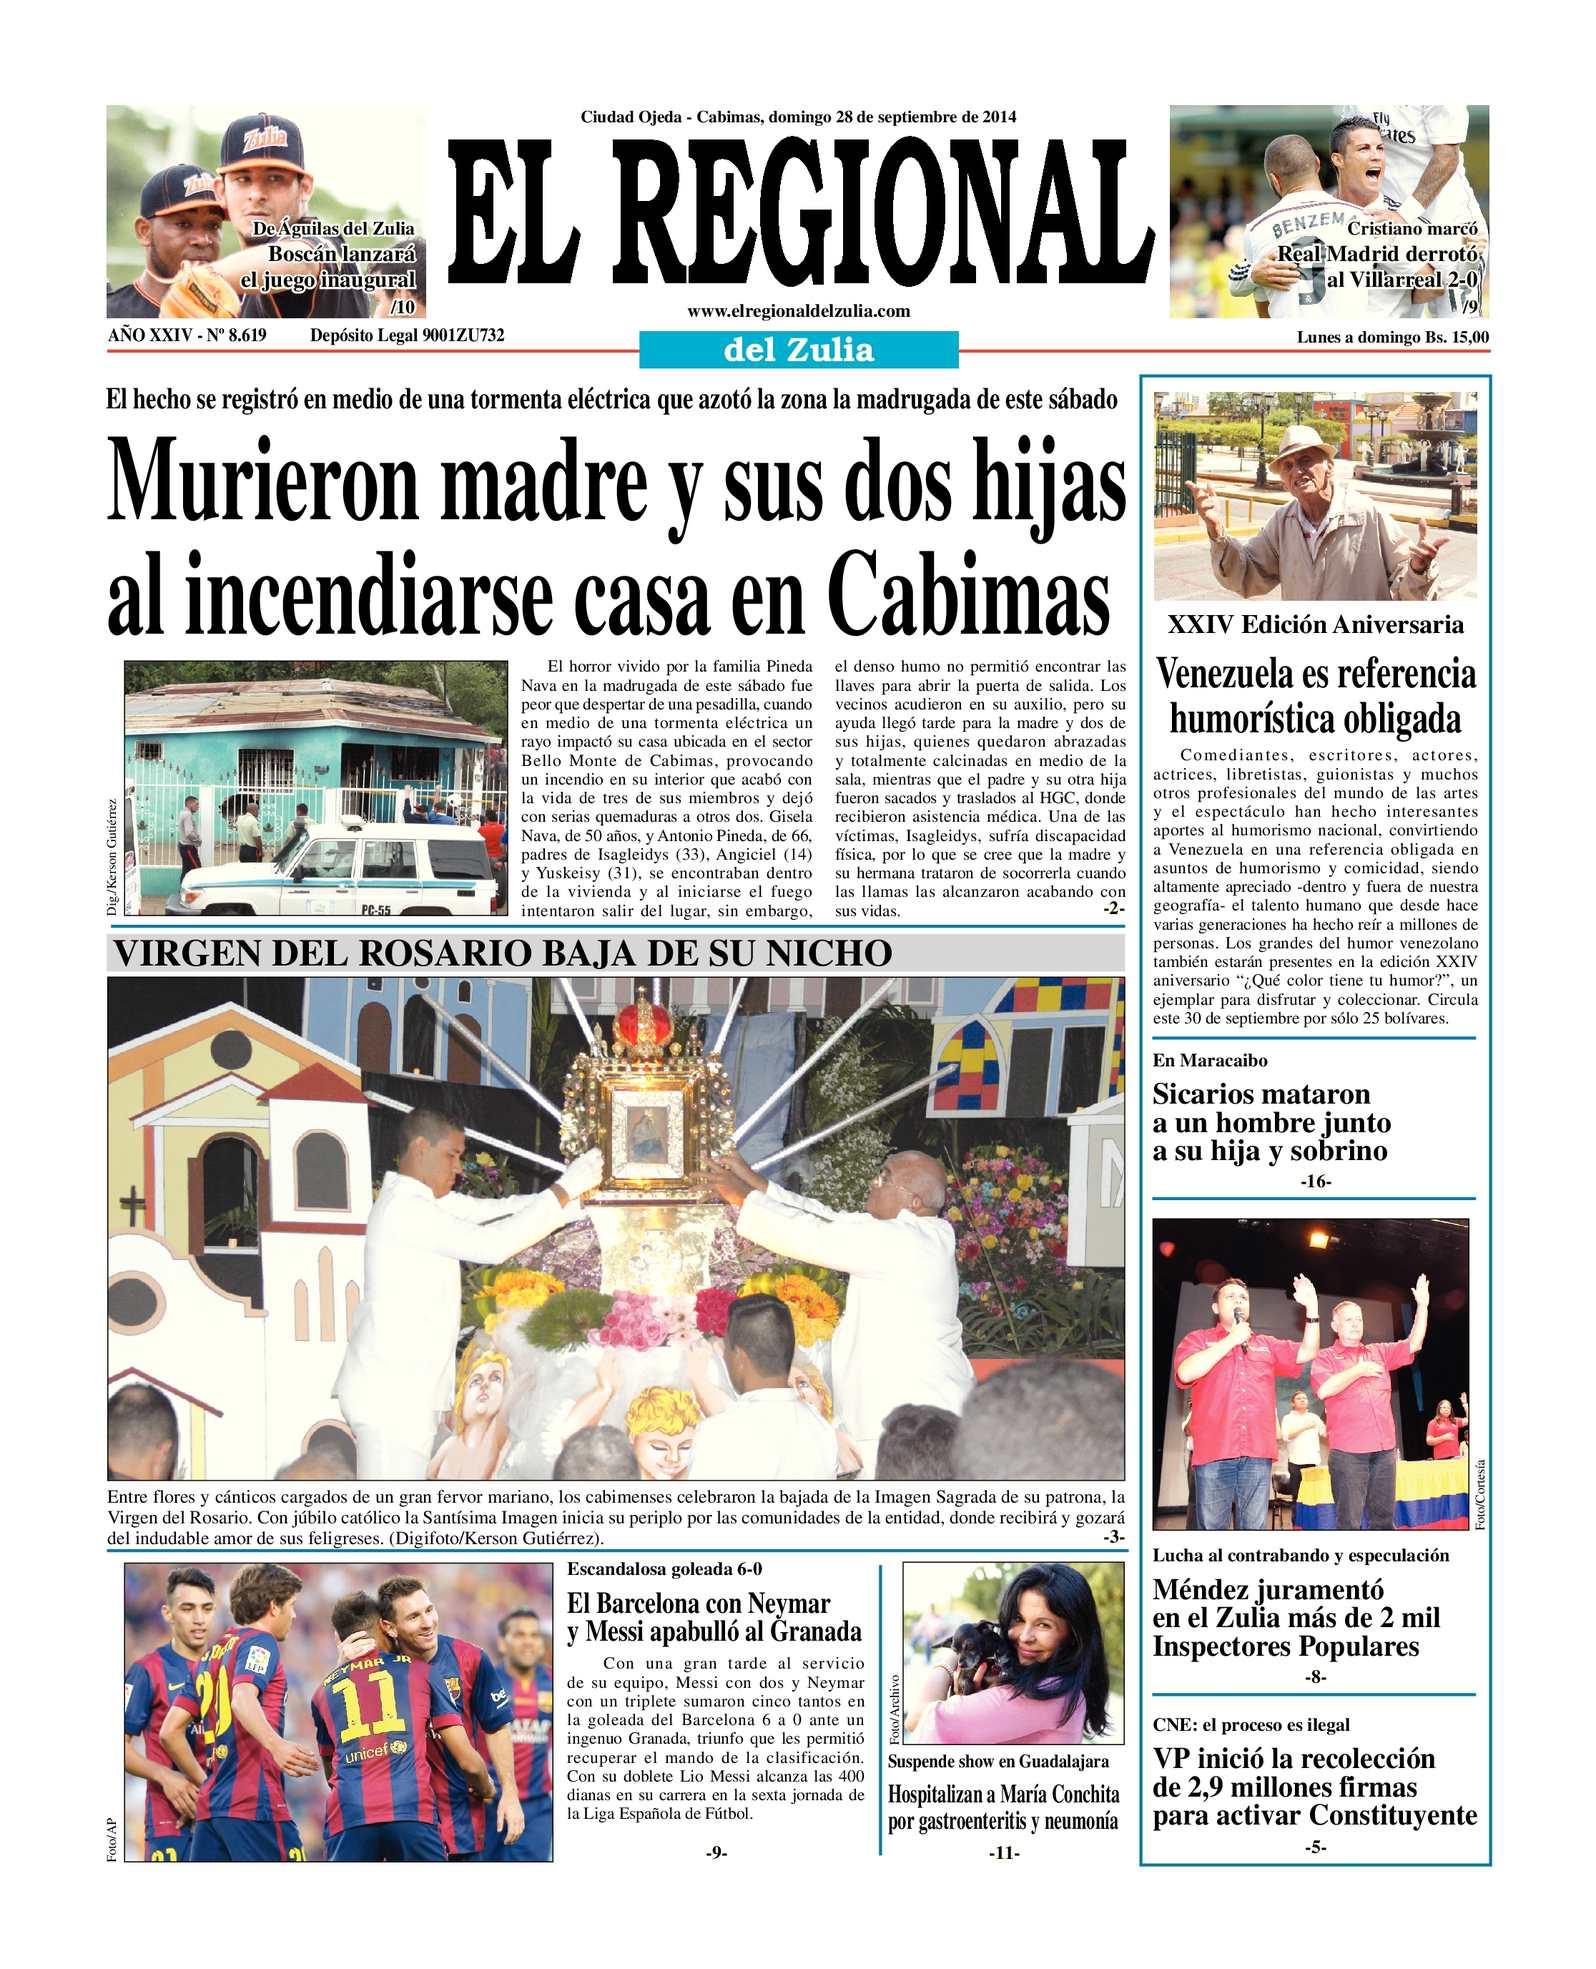 Calaméo - El Regional del Zulia 28-09-2014